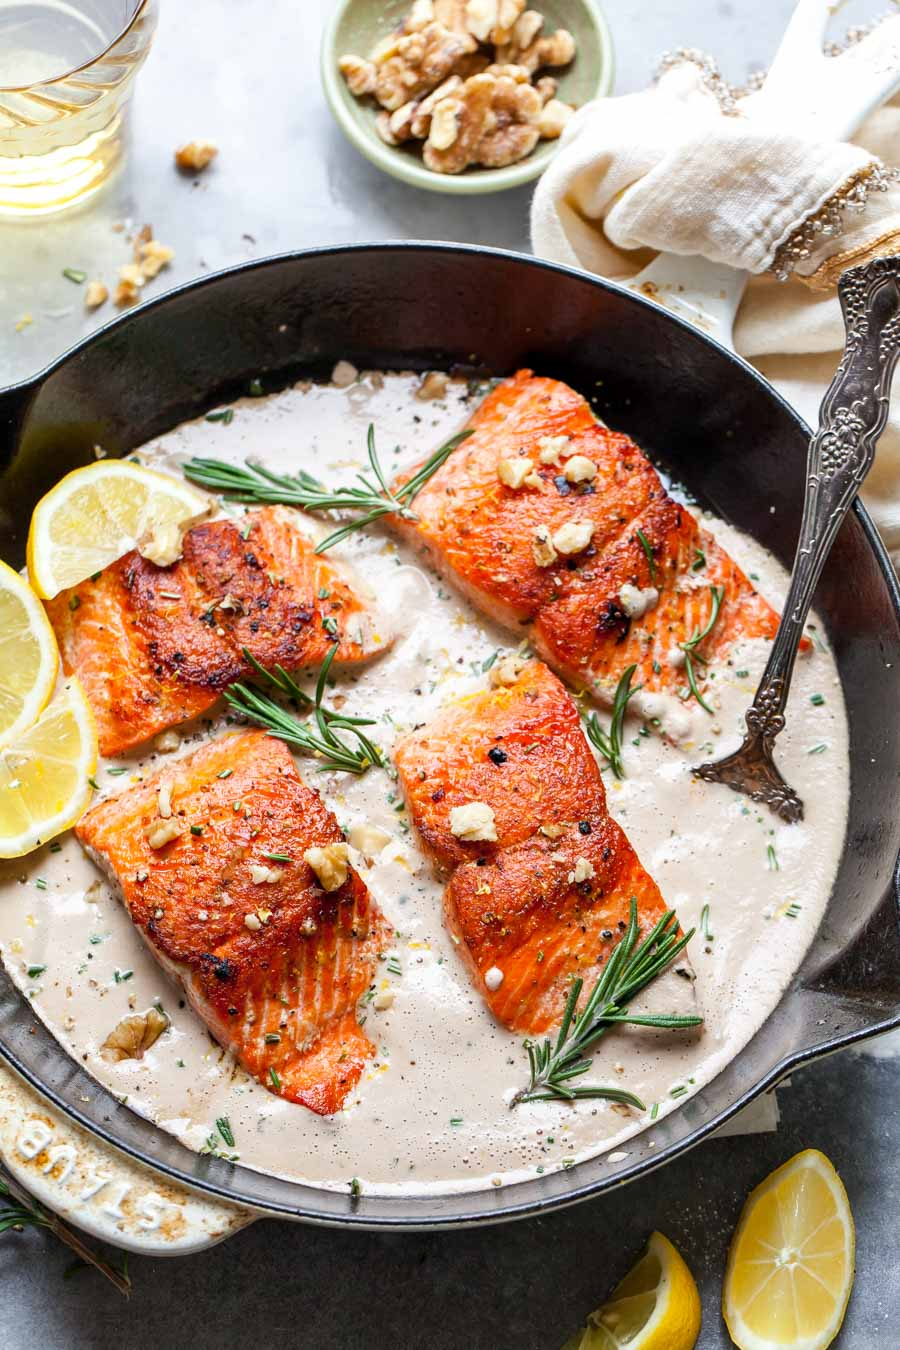 Pan-Seared Salmon with Creamy Walnut-Rosemary Sauce